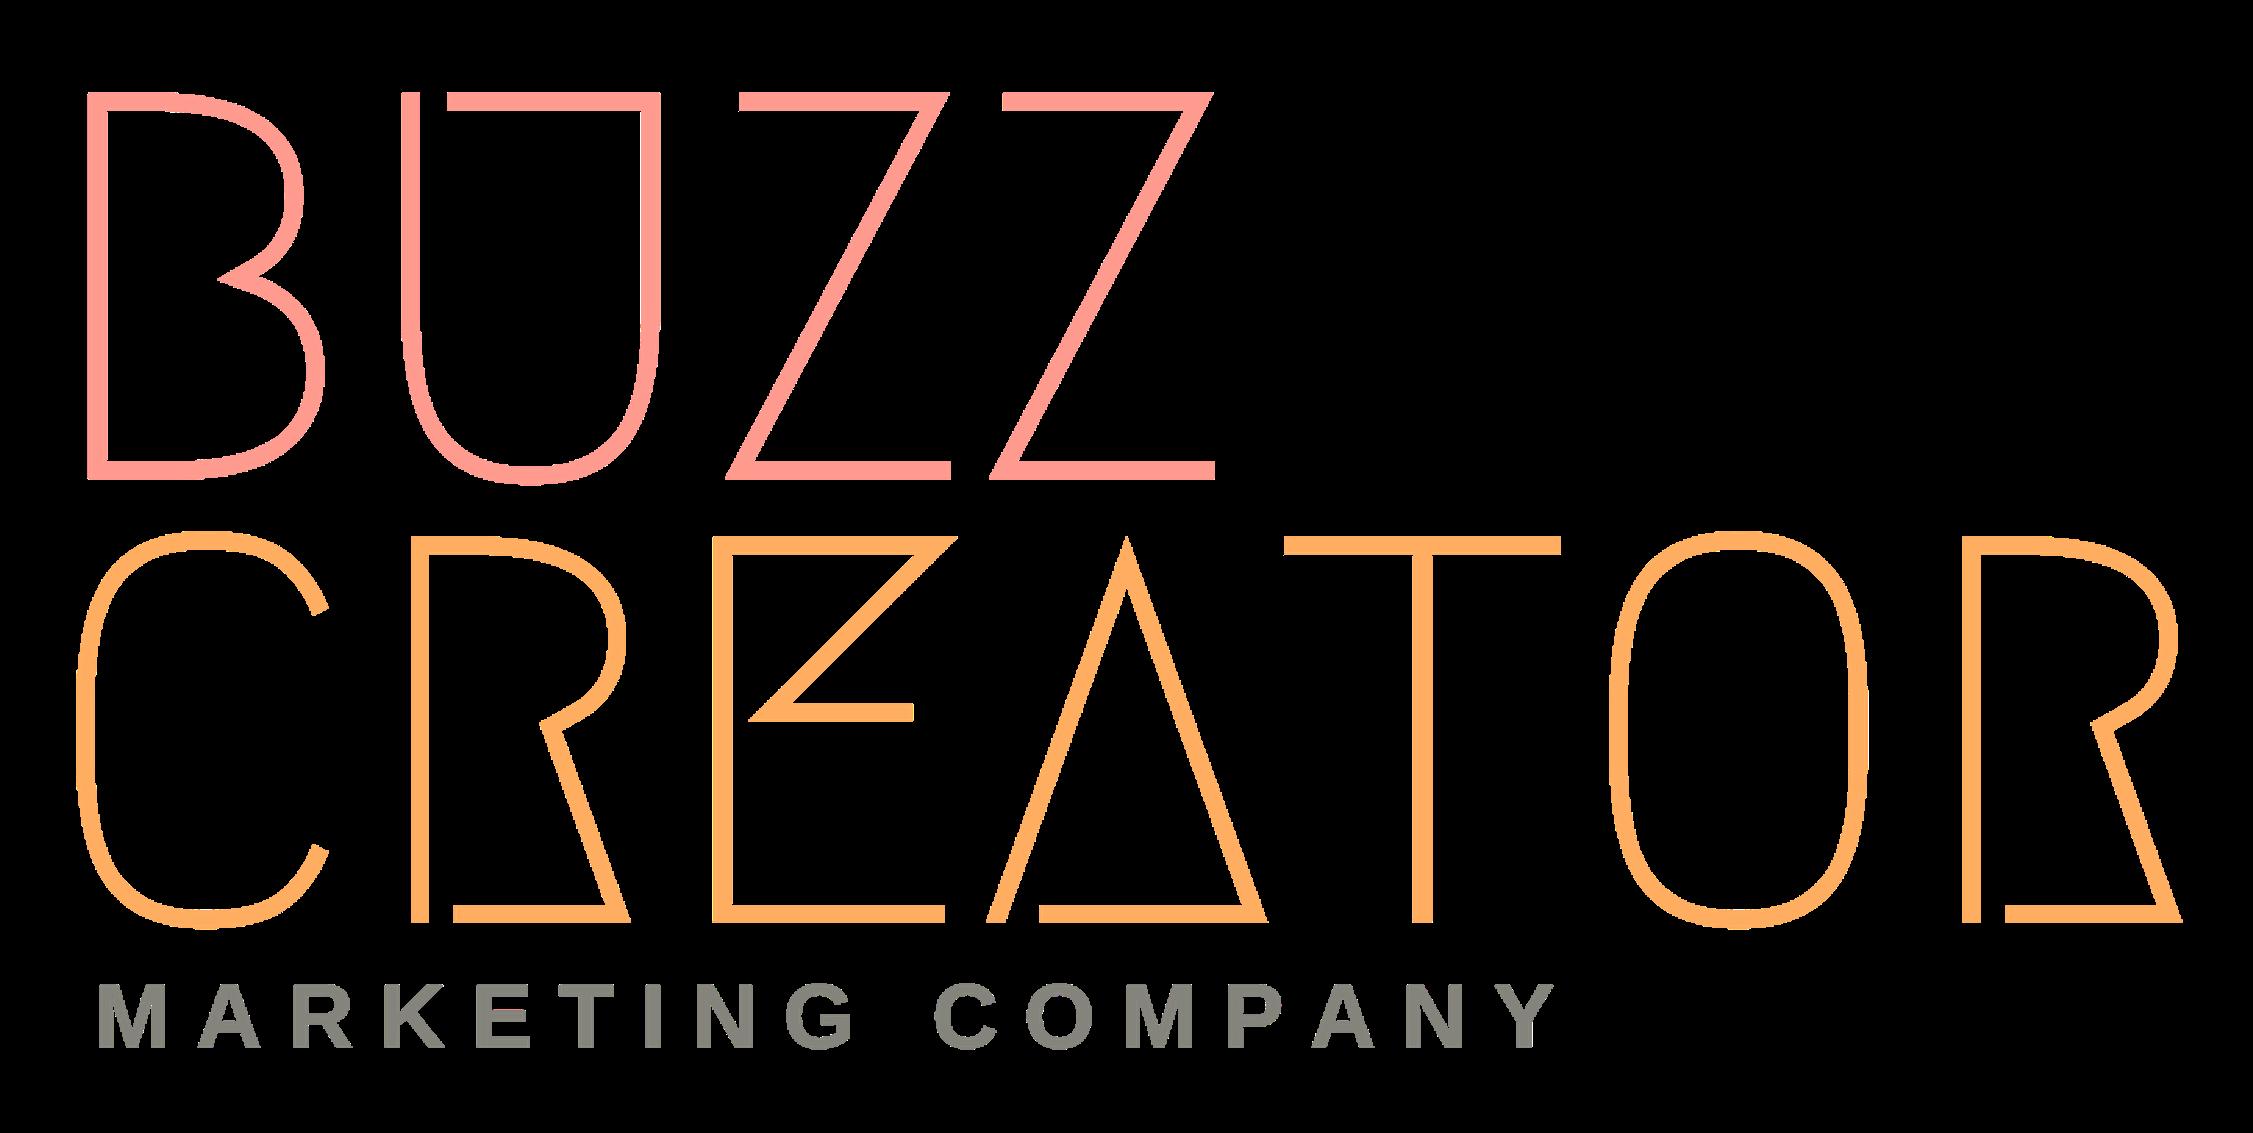 Buzz Creator